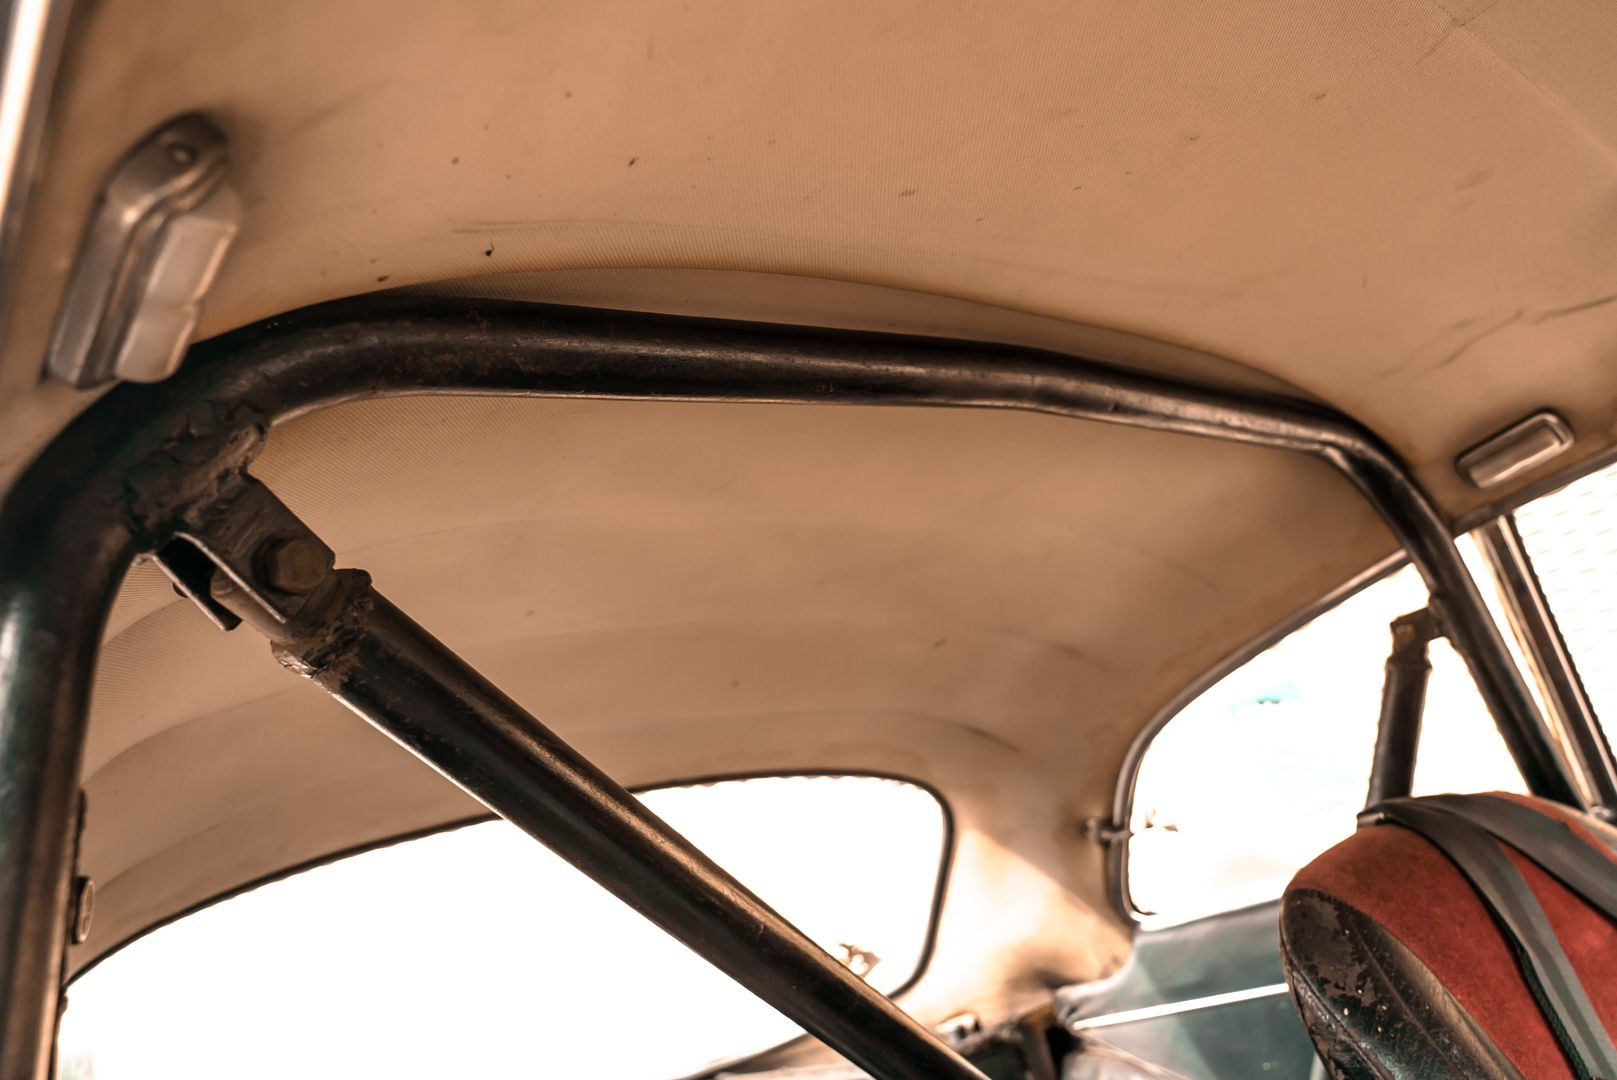 1962 Alfa Romeo Giulietta Sprint 1300 Race Car 69419